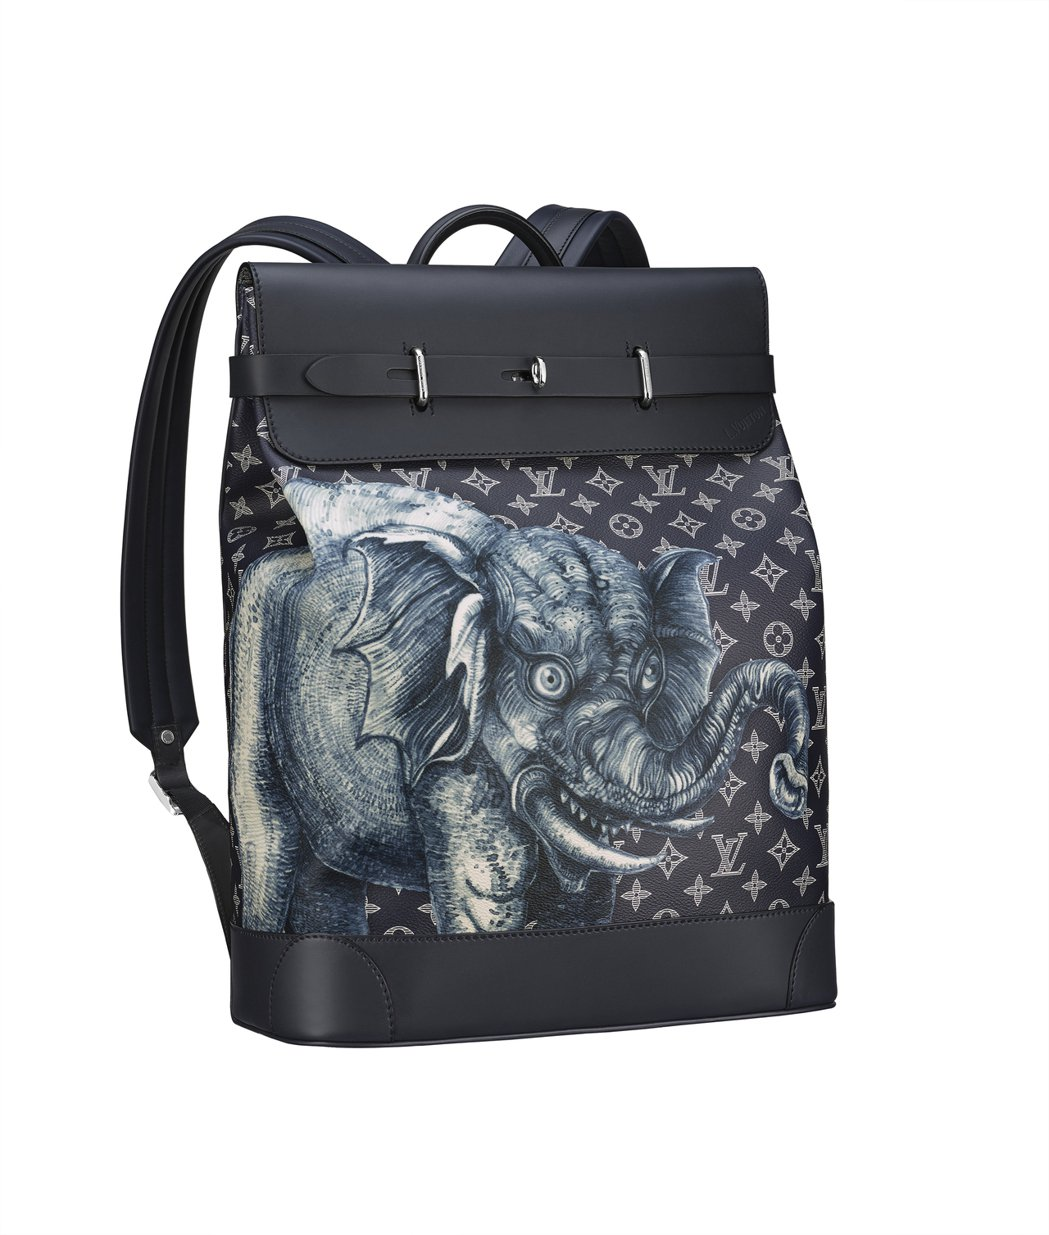 Steamer後背包,售價113,000元。圖/LV提供